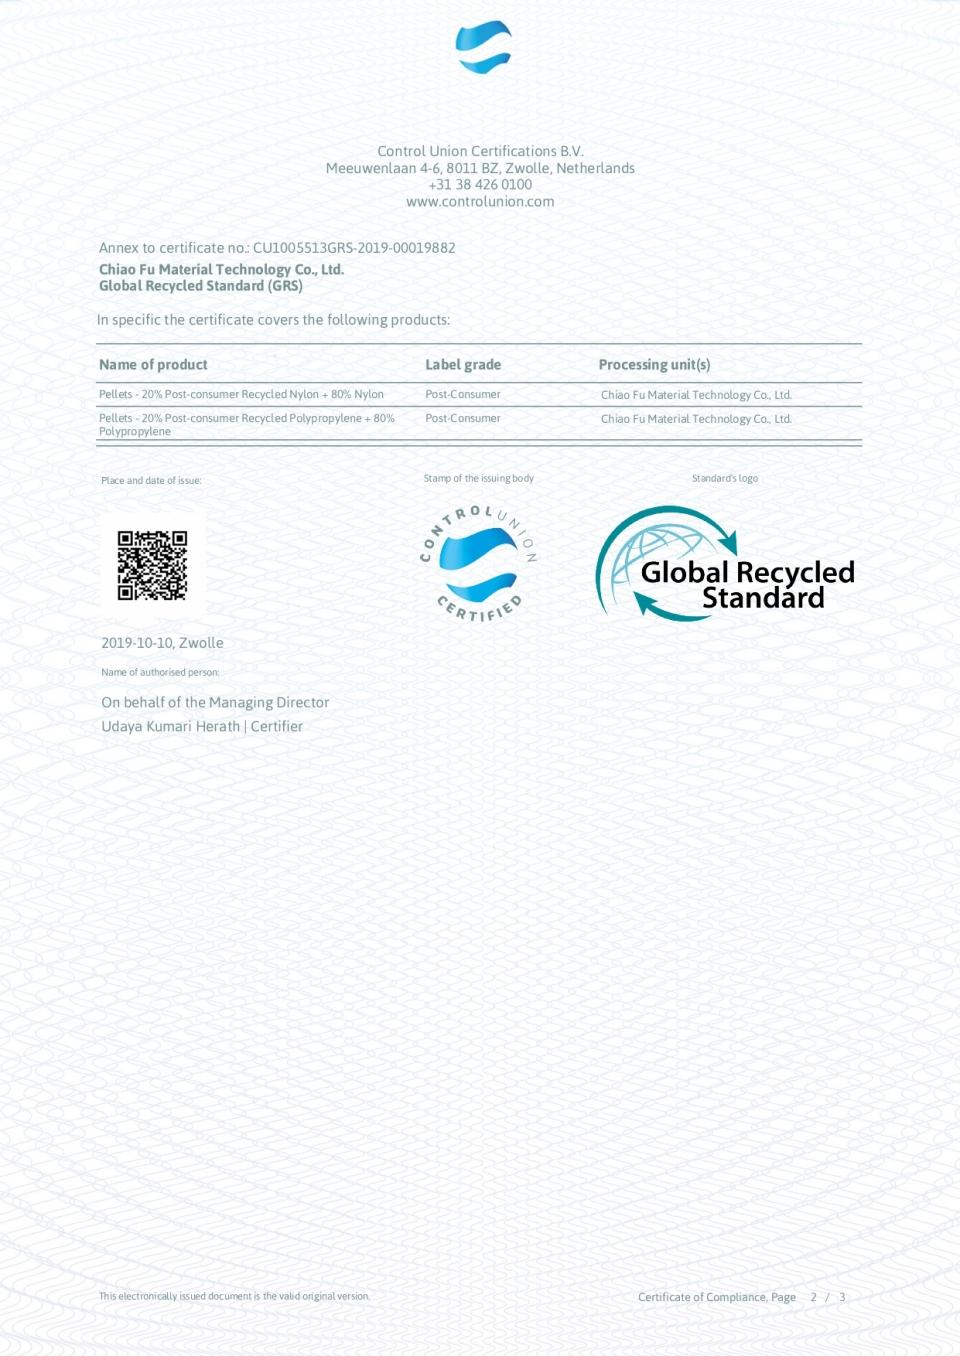 GRS_Scope_Certificate_2019-10-10 13_12_26 UTC_page-0002